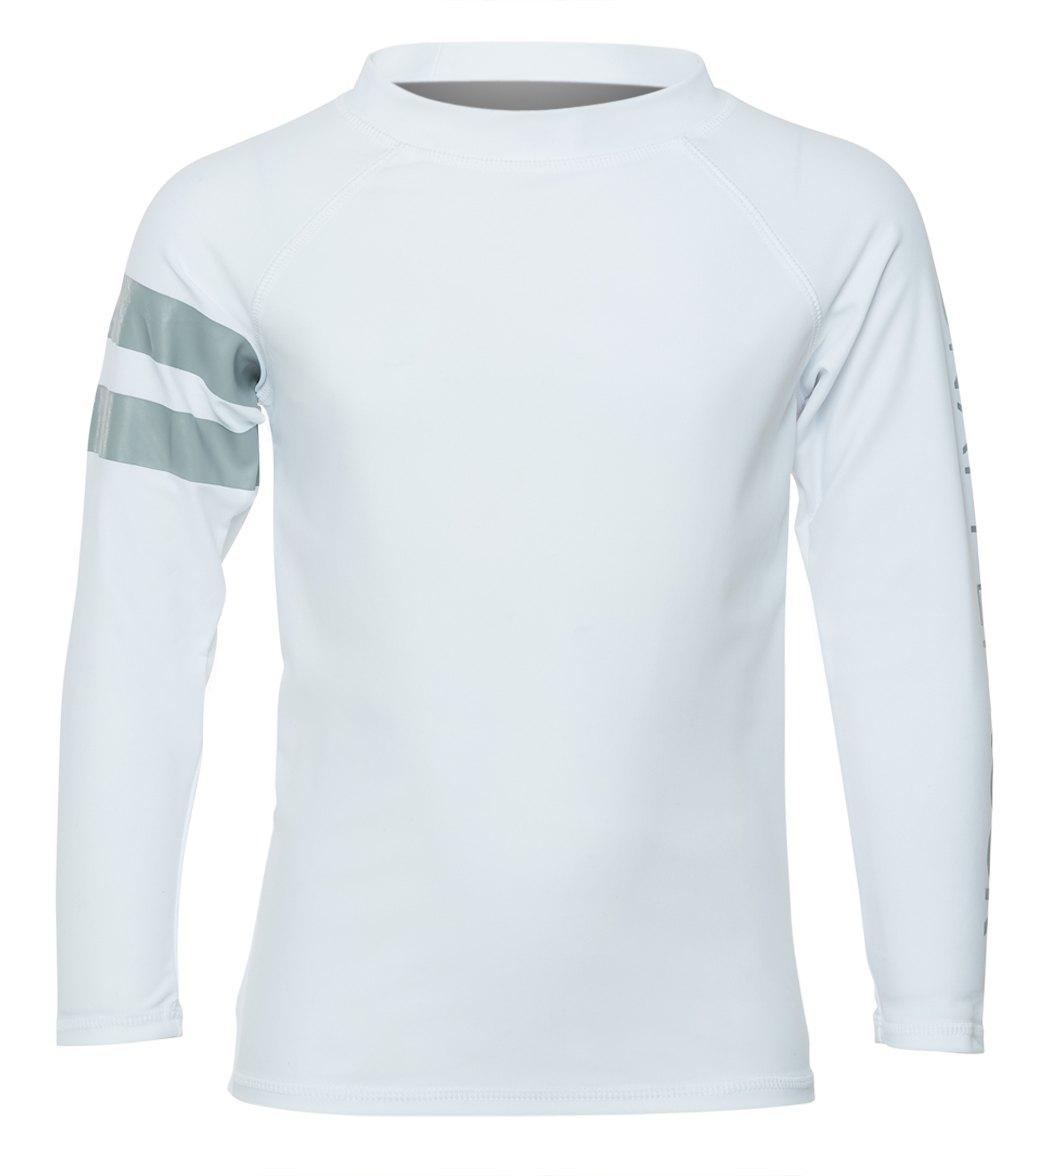 Rash Guard Shirt Snapper Rock Boys Long Sleeve UPF 50